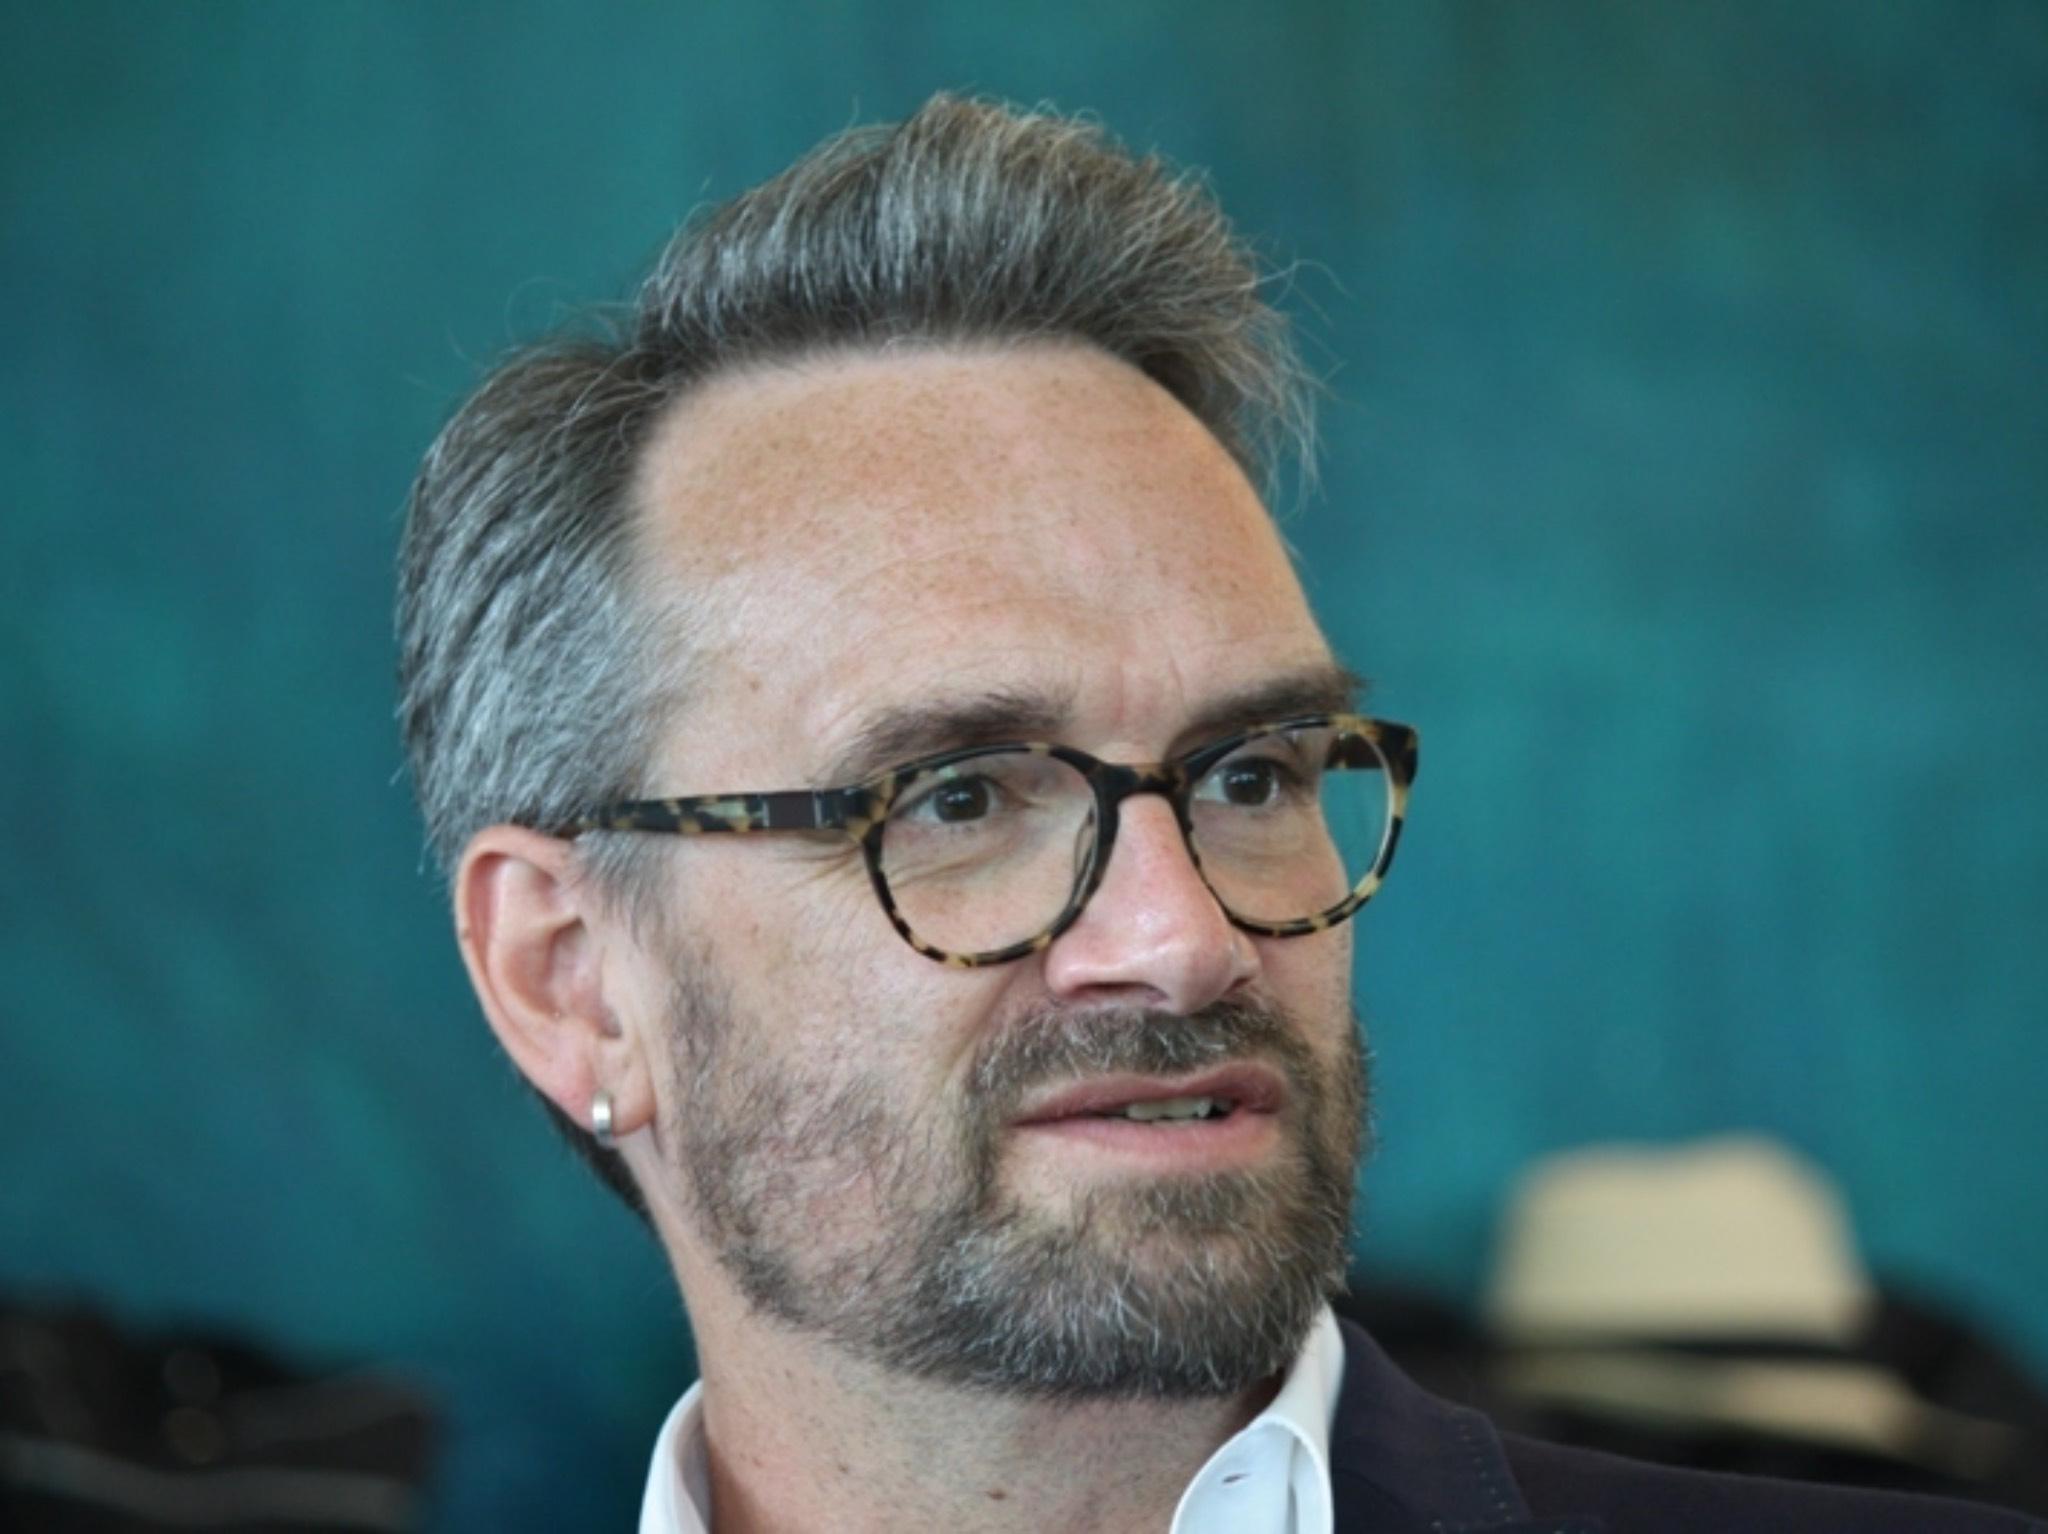 Wolfgang Weber ist Chefmaskenbildner am Mainfranken Theater. Foto: privat